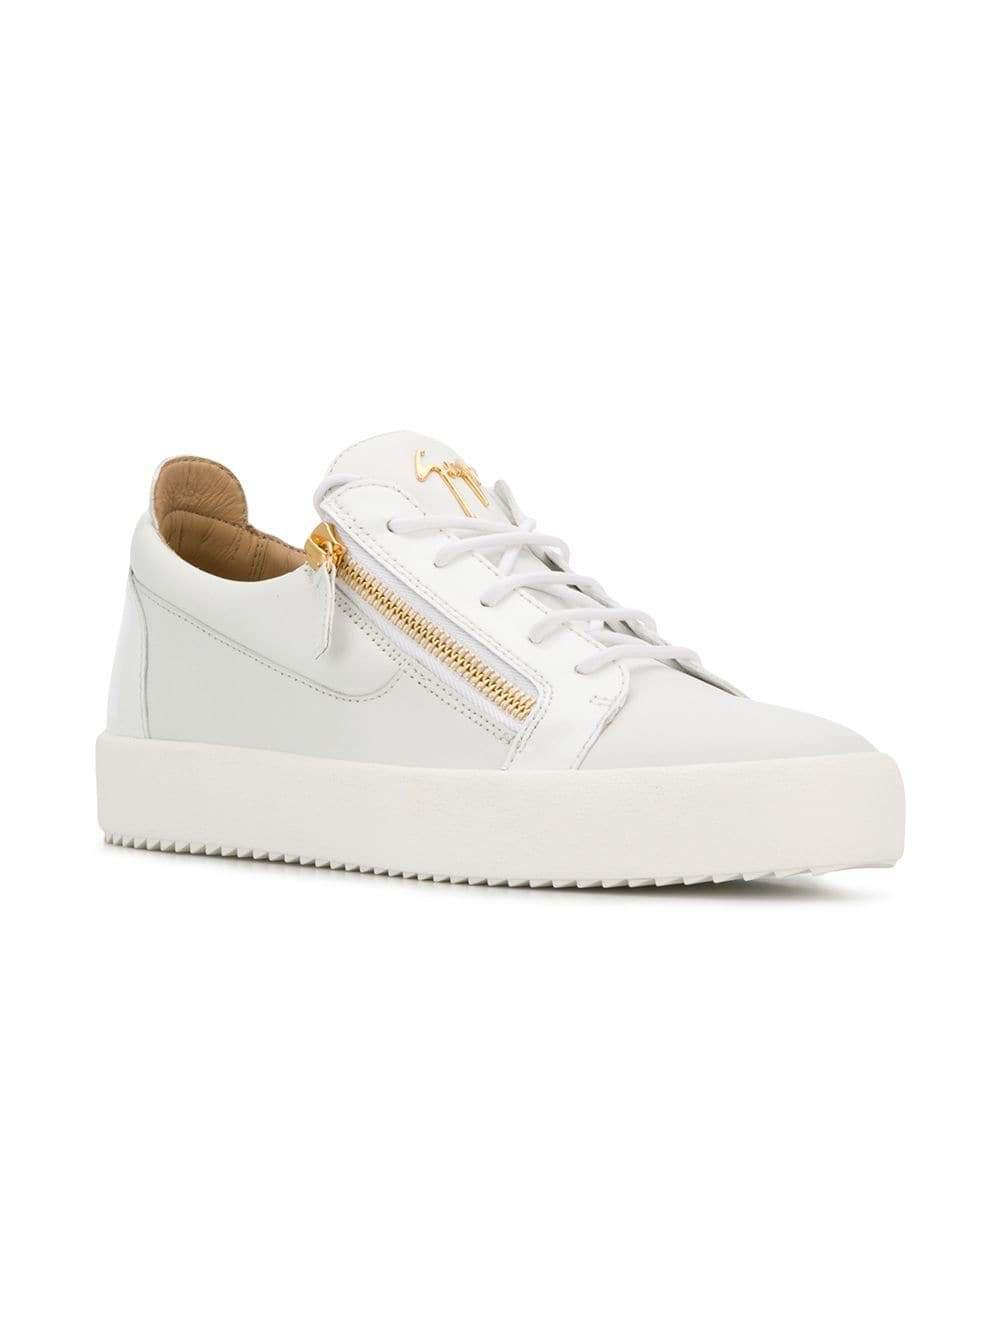 4dbca51f0659f Lyst - Giuseppe Zanotti Design Frankie Low-top Sneakers in White for Men